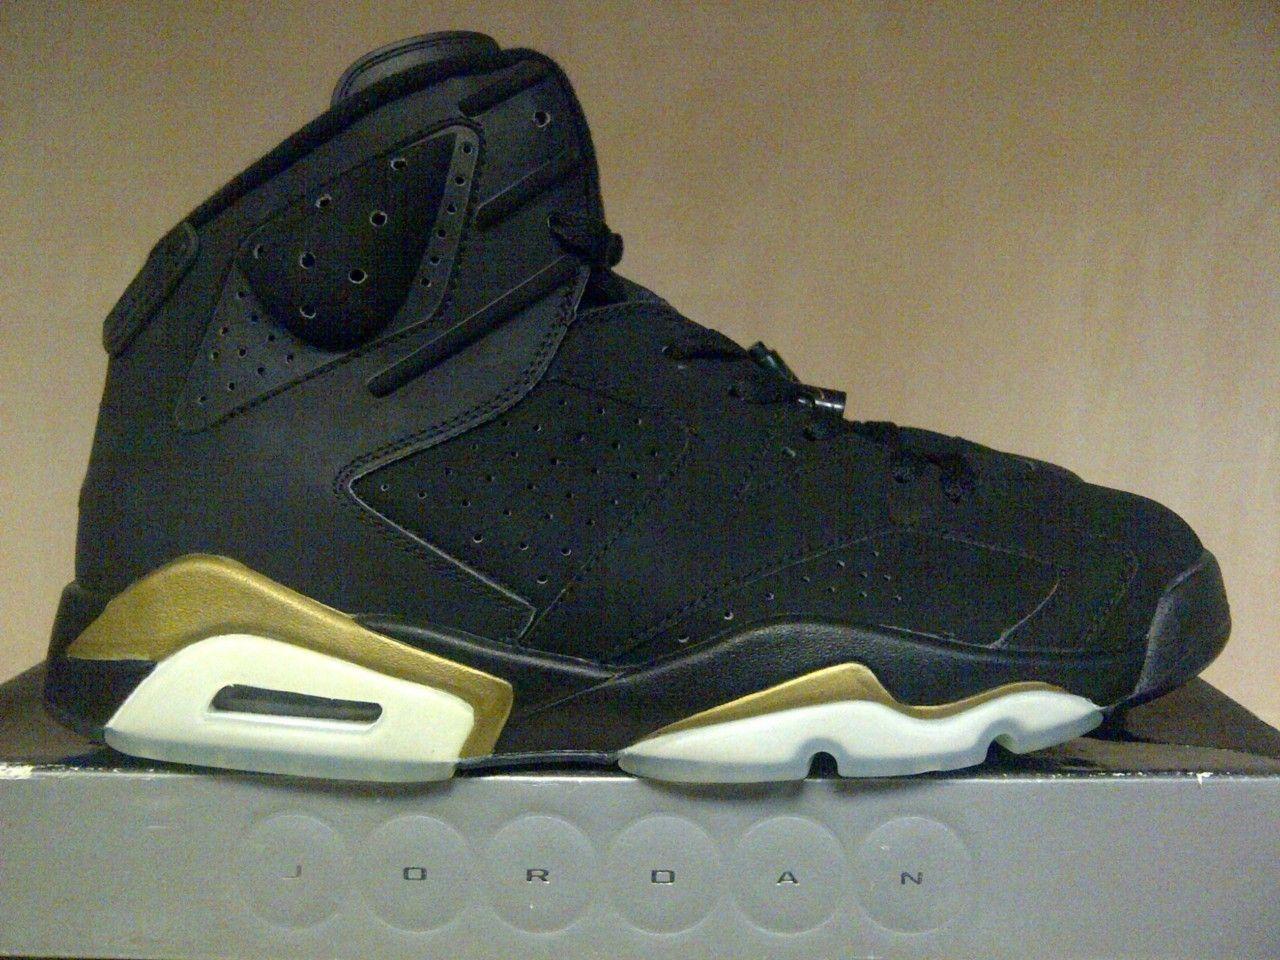 best sneakers b3650 b41f0 NIKE AIR JORDAN VI 6 DMP OG DS QS TOKYO RARE SAMPLE PROMO CONCORD V IV XI  US10.5   eBay